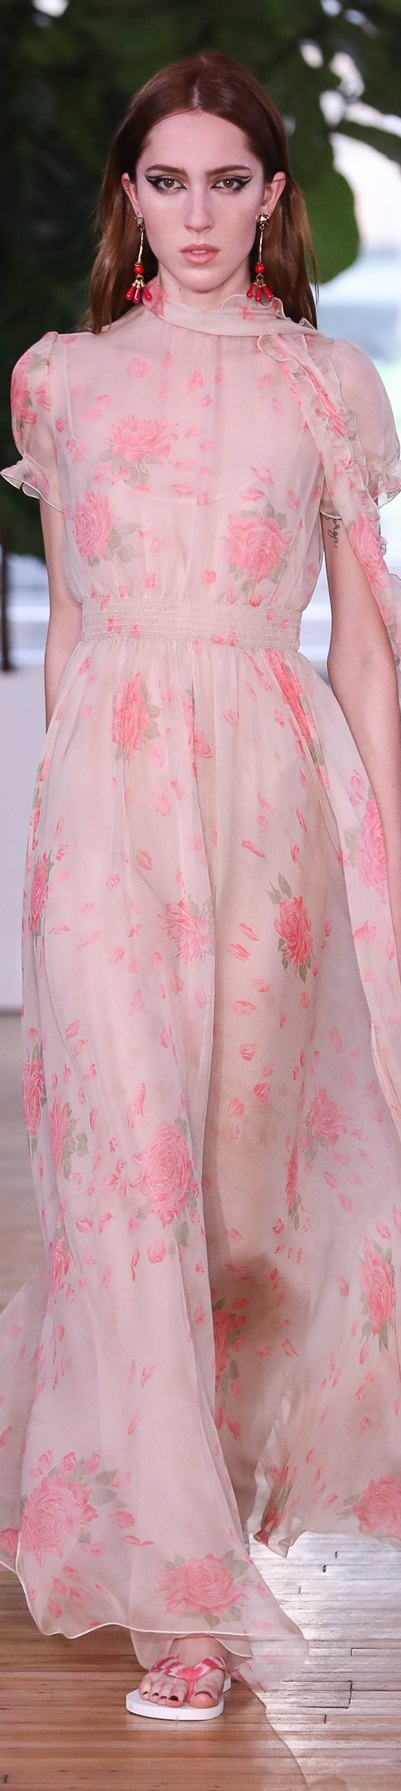 Dior cruise 2018 valentino.com